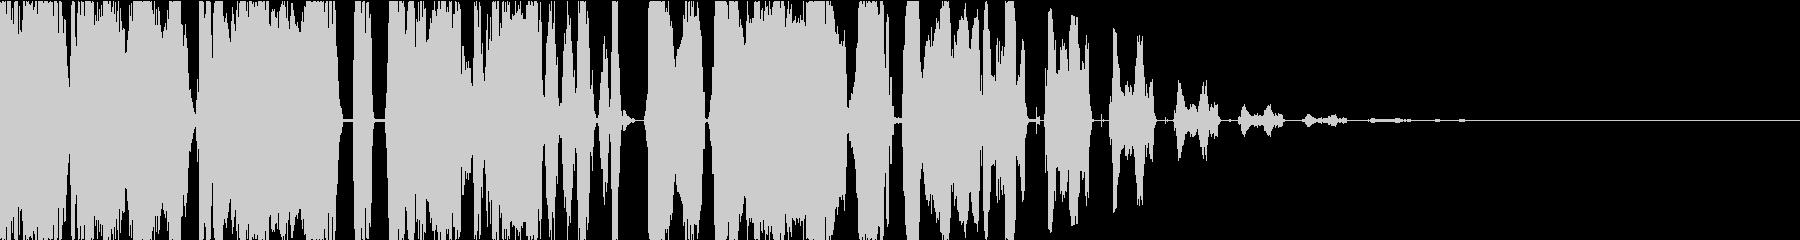 DJスクラッチボーカルチョップジングルcの未再生の波形